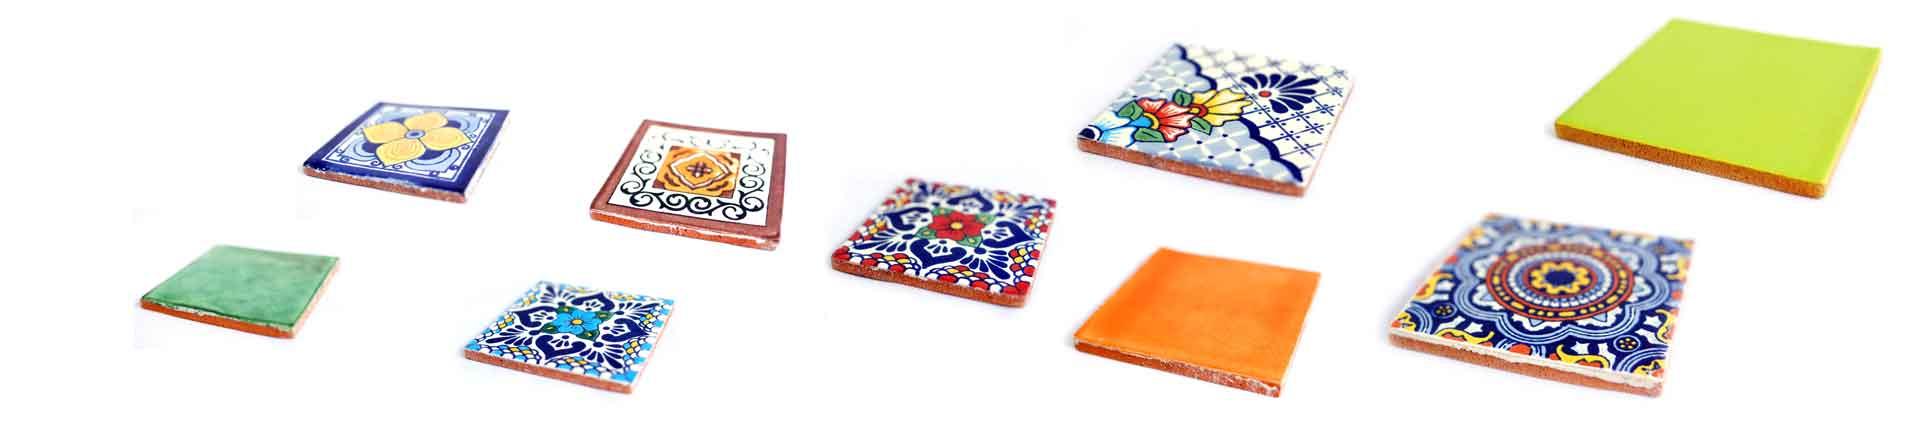 mexikanische keramik waschbecken fliesen aus mexiko burro azul. Black Bedroom Furniture Sets. Home Design Ideas